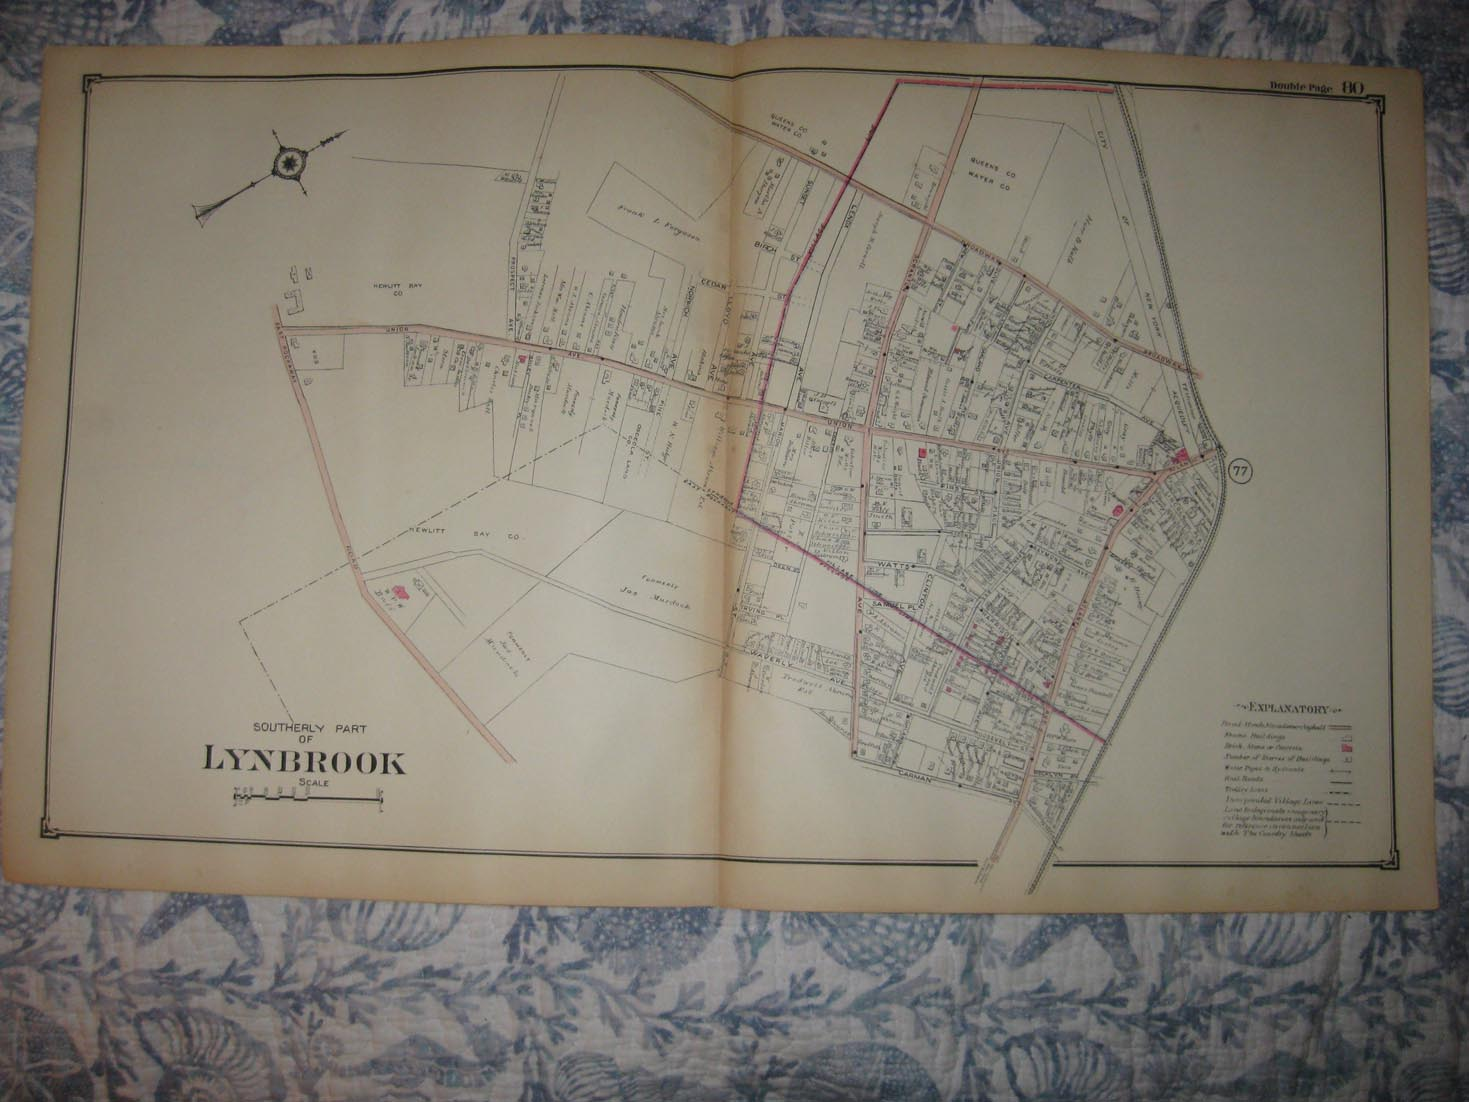 1804 NY MAP Lockport Peekskill Franklin Square New York History VERY BIG